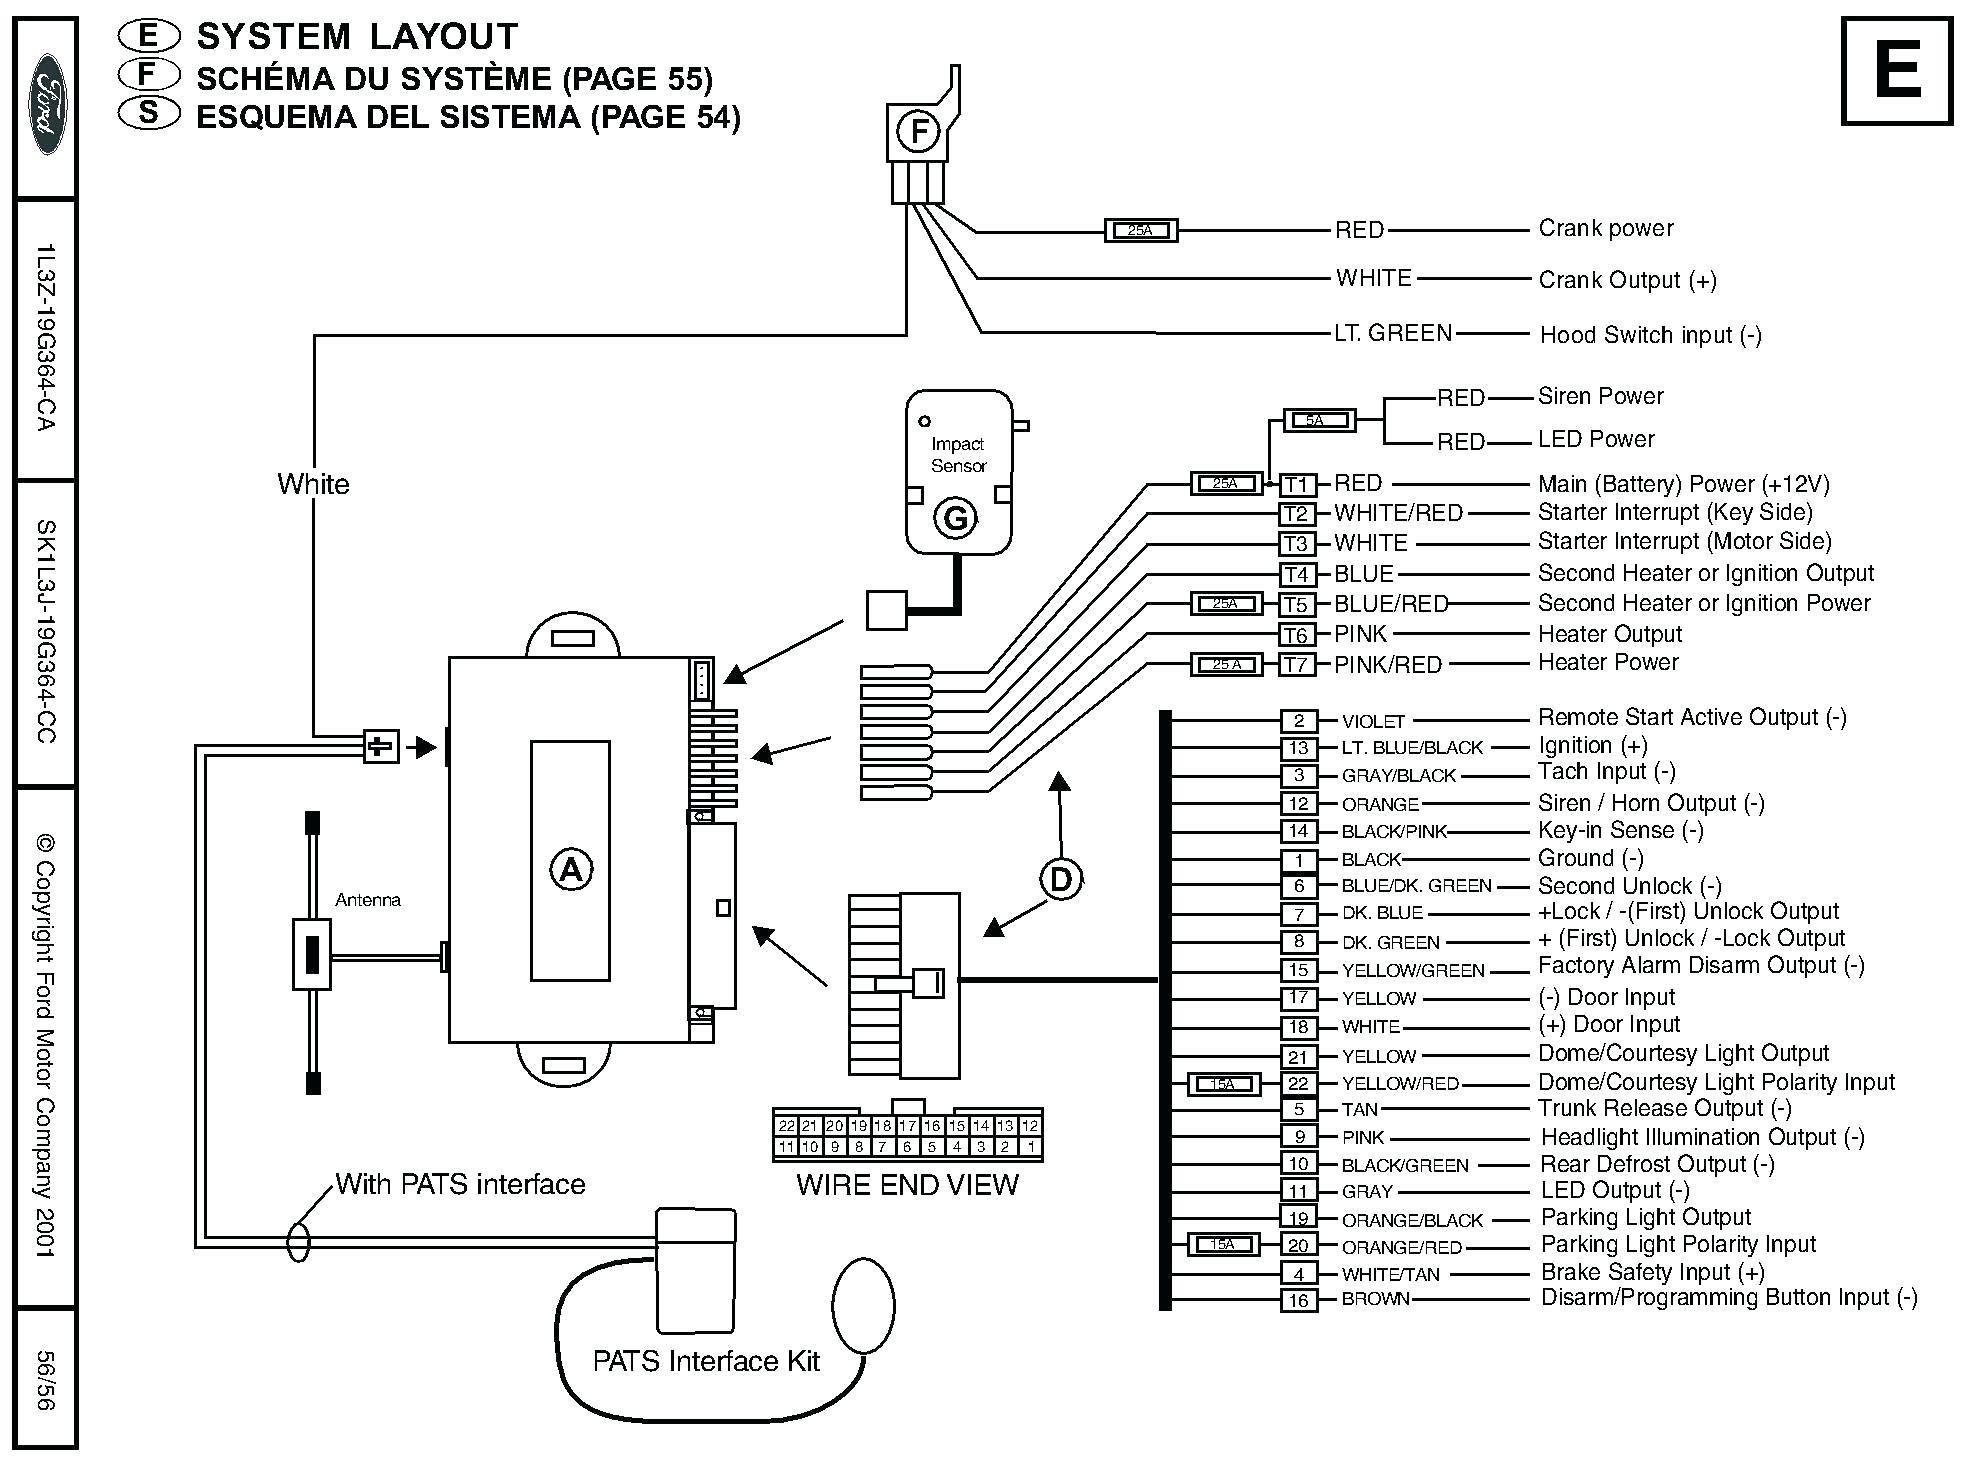 Generac Smart Switch Wiring Diagram